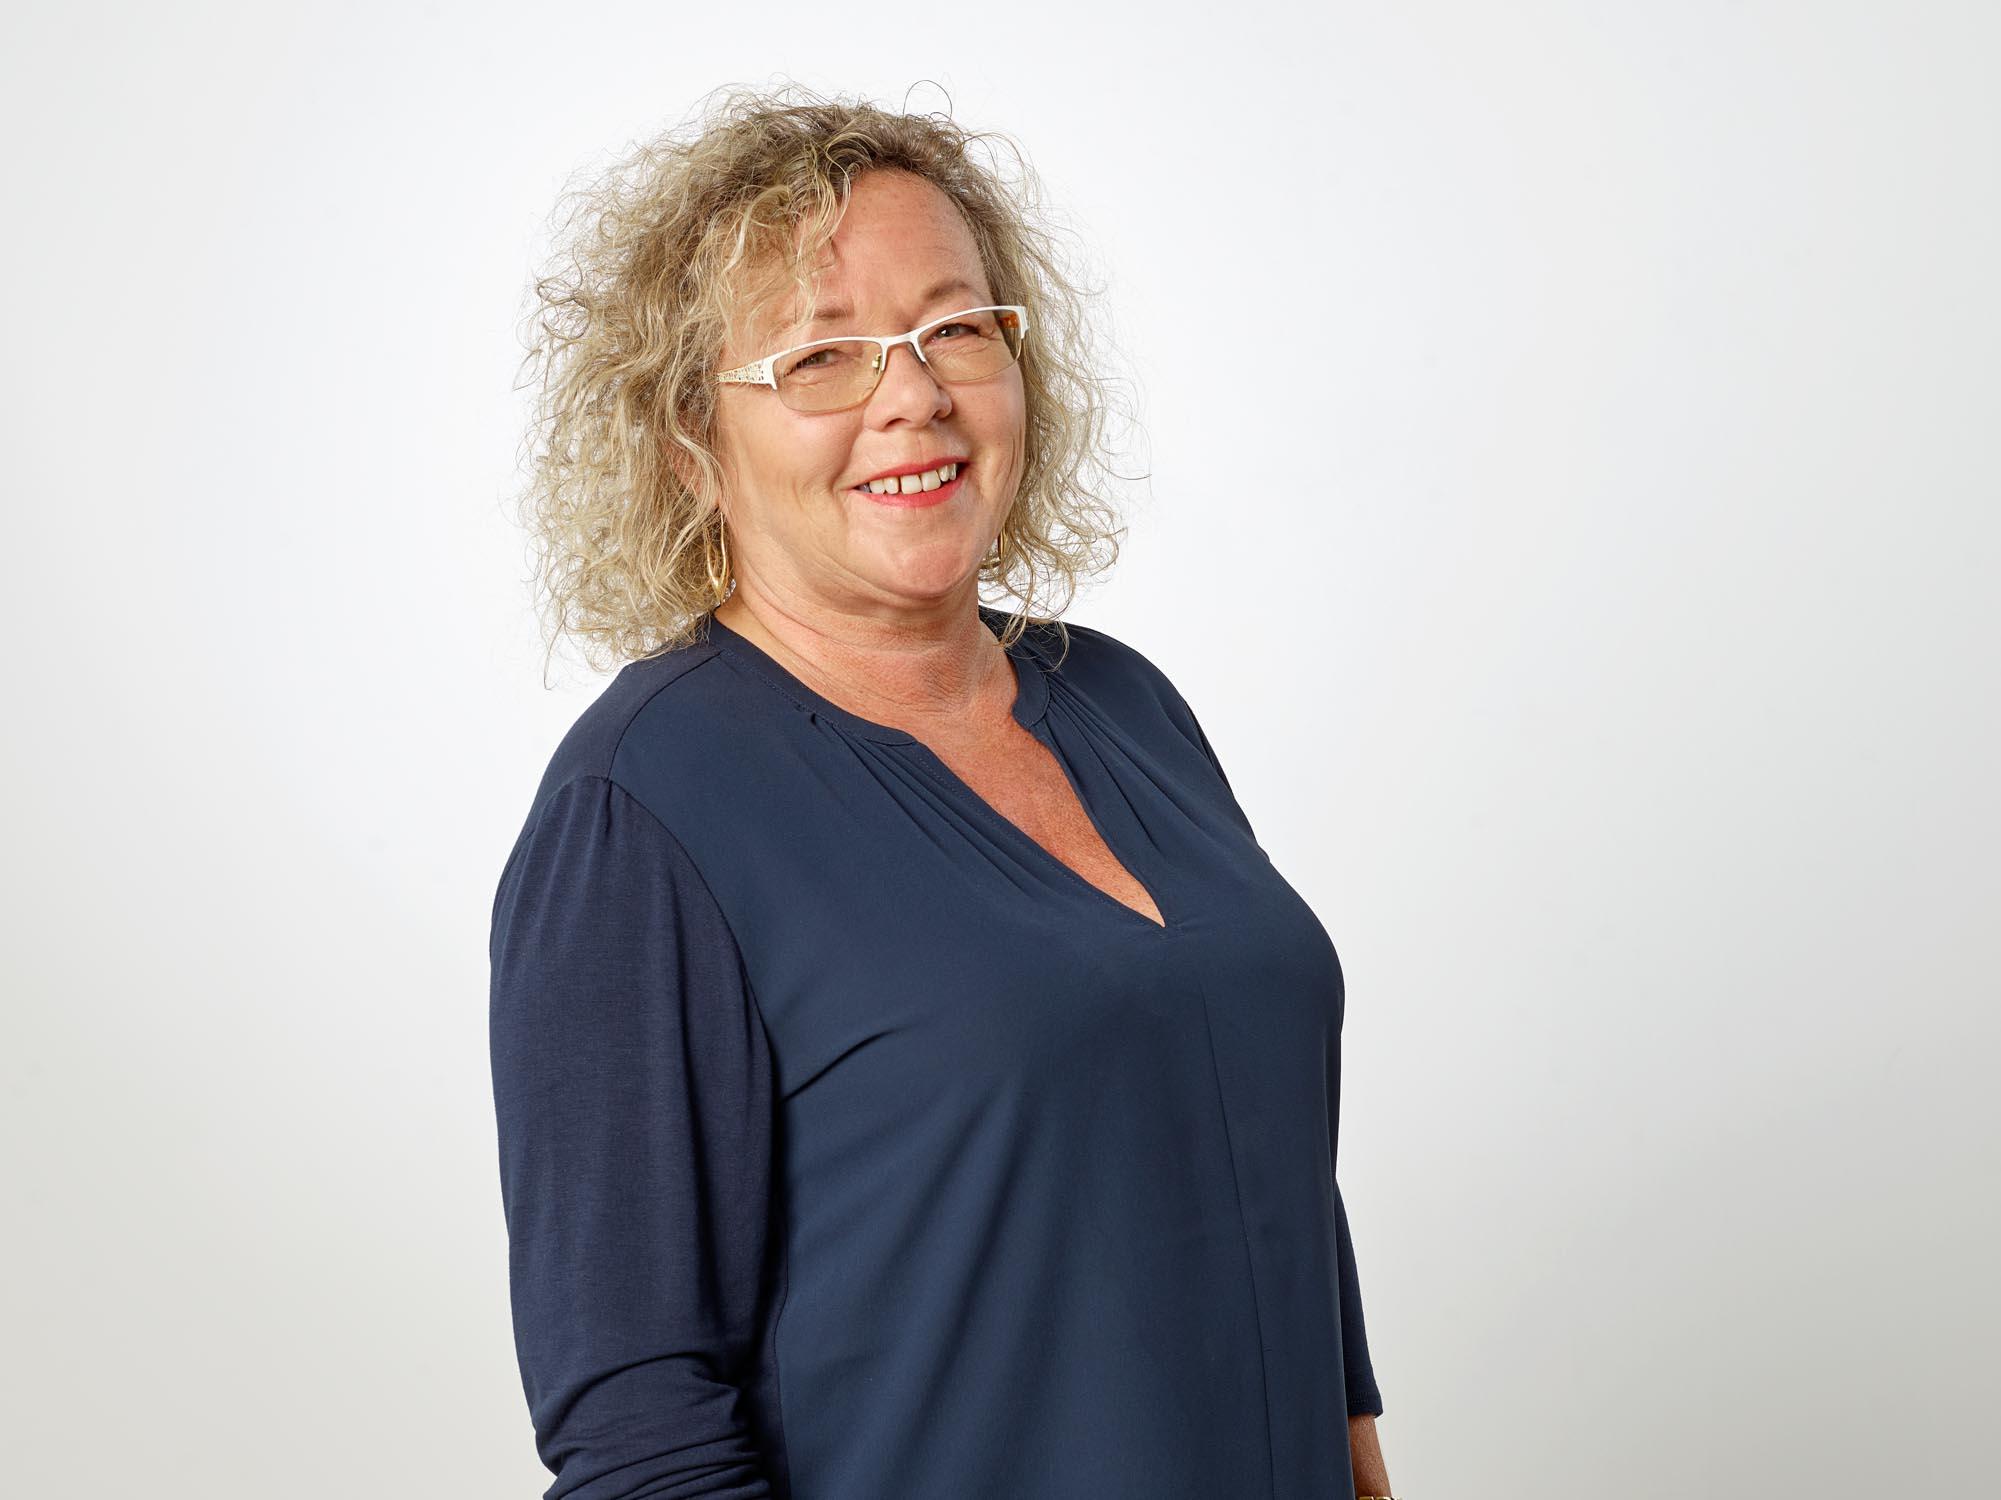 Sabine Rudert